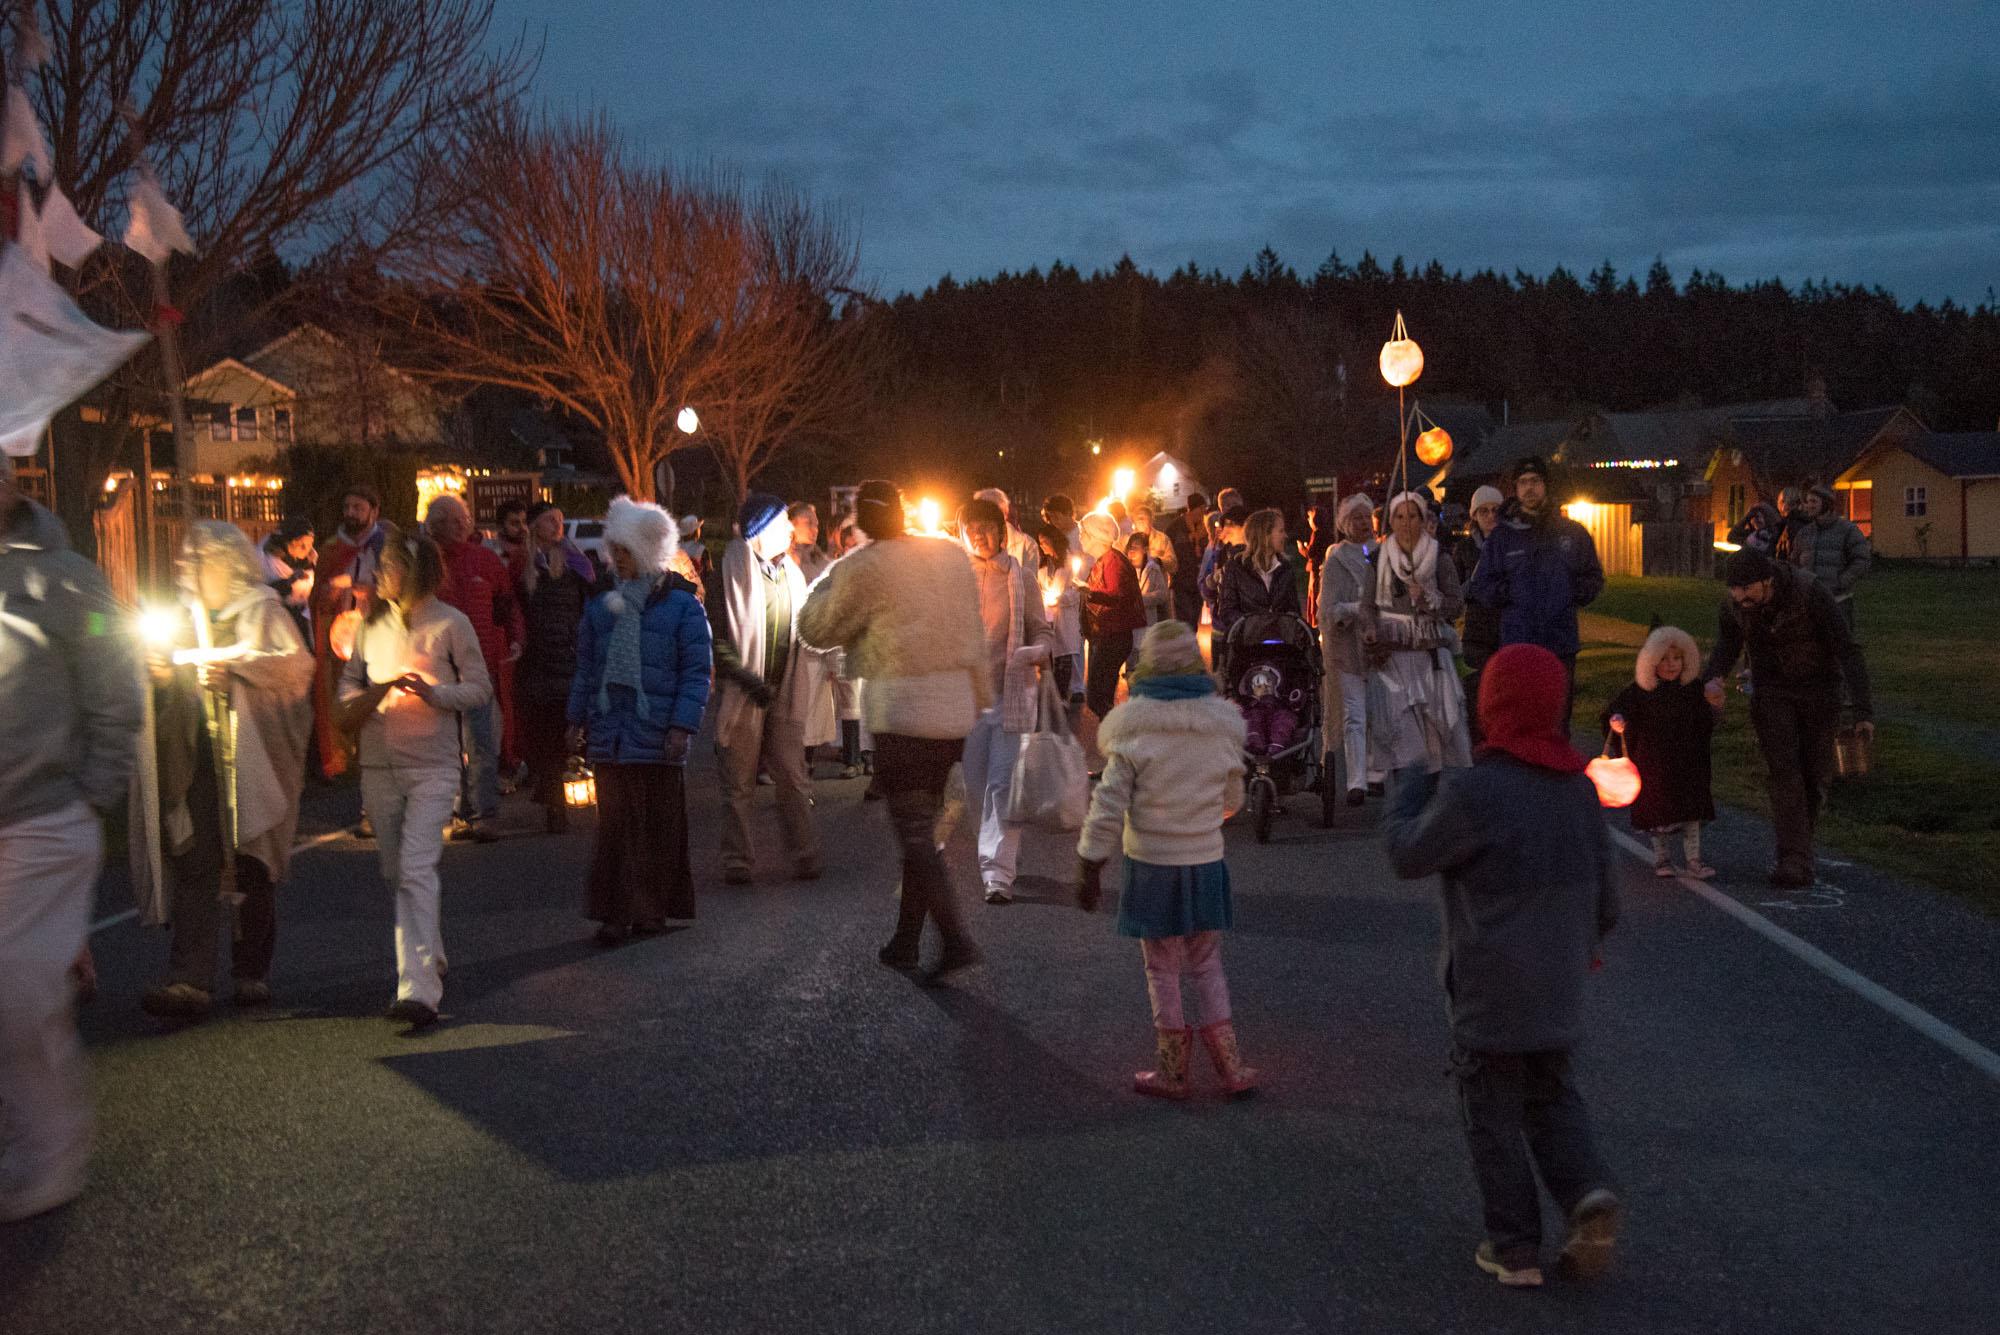 Winter's Village Lighting Celebration